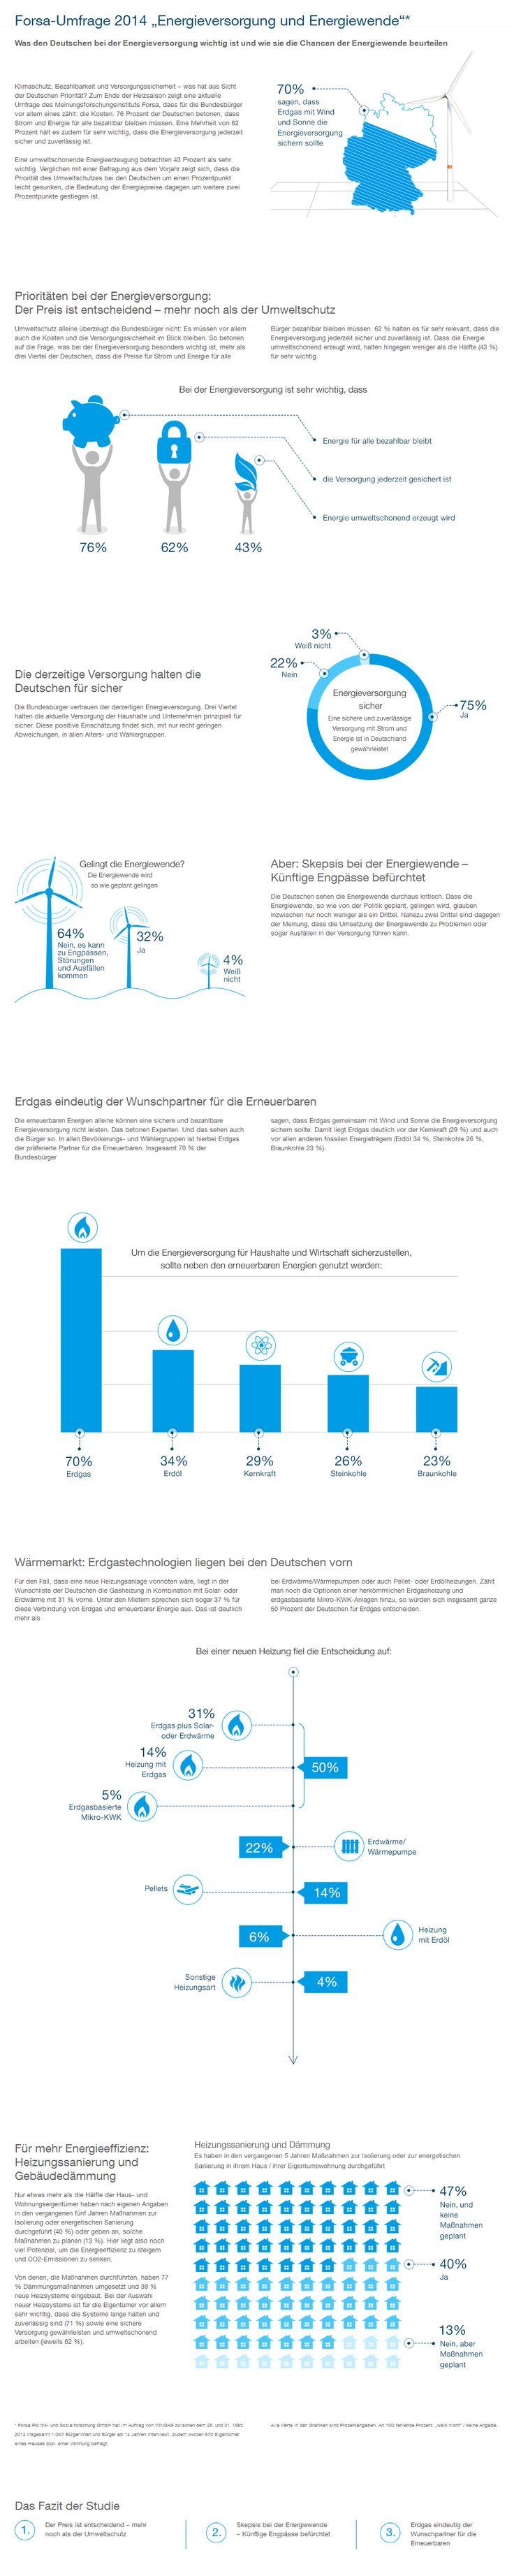 Studie, Infografik, WINGAS, Design, Infographic, Blau, Cyan, 2015, Gas, Energie, Forsa, Umfrage, Sparen, Energiewende